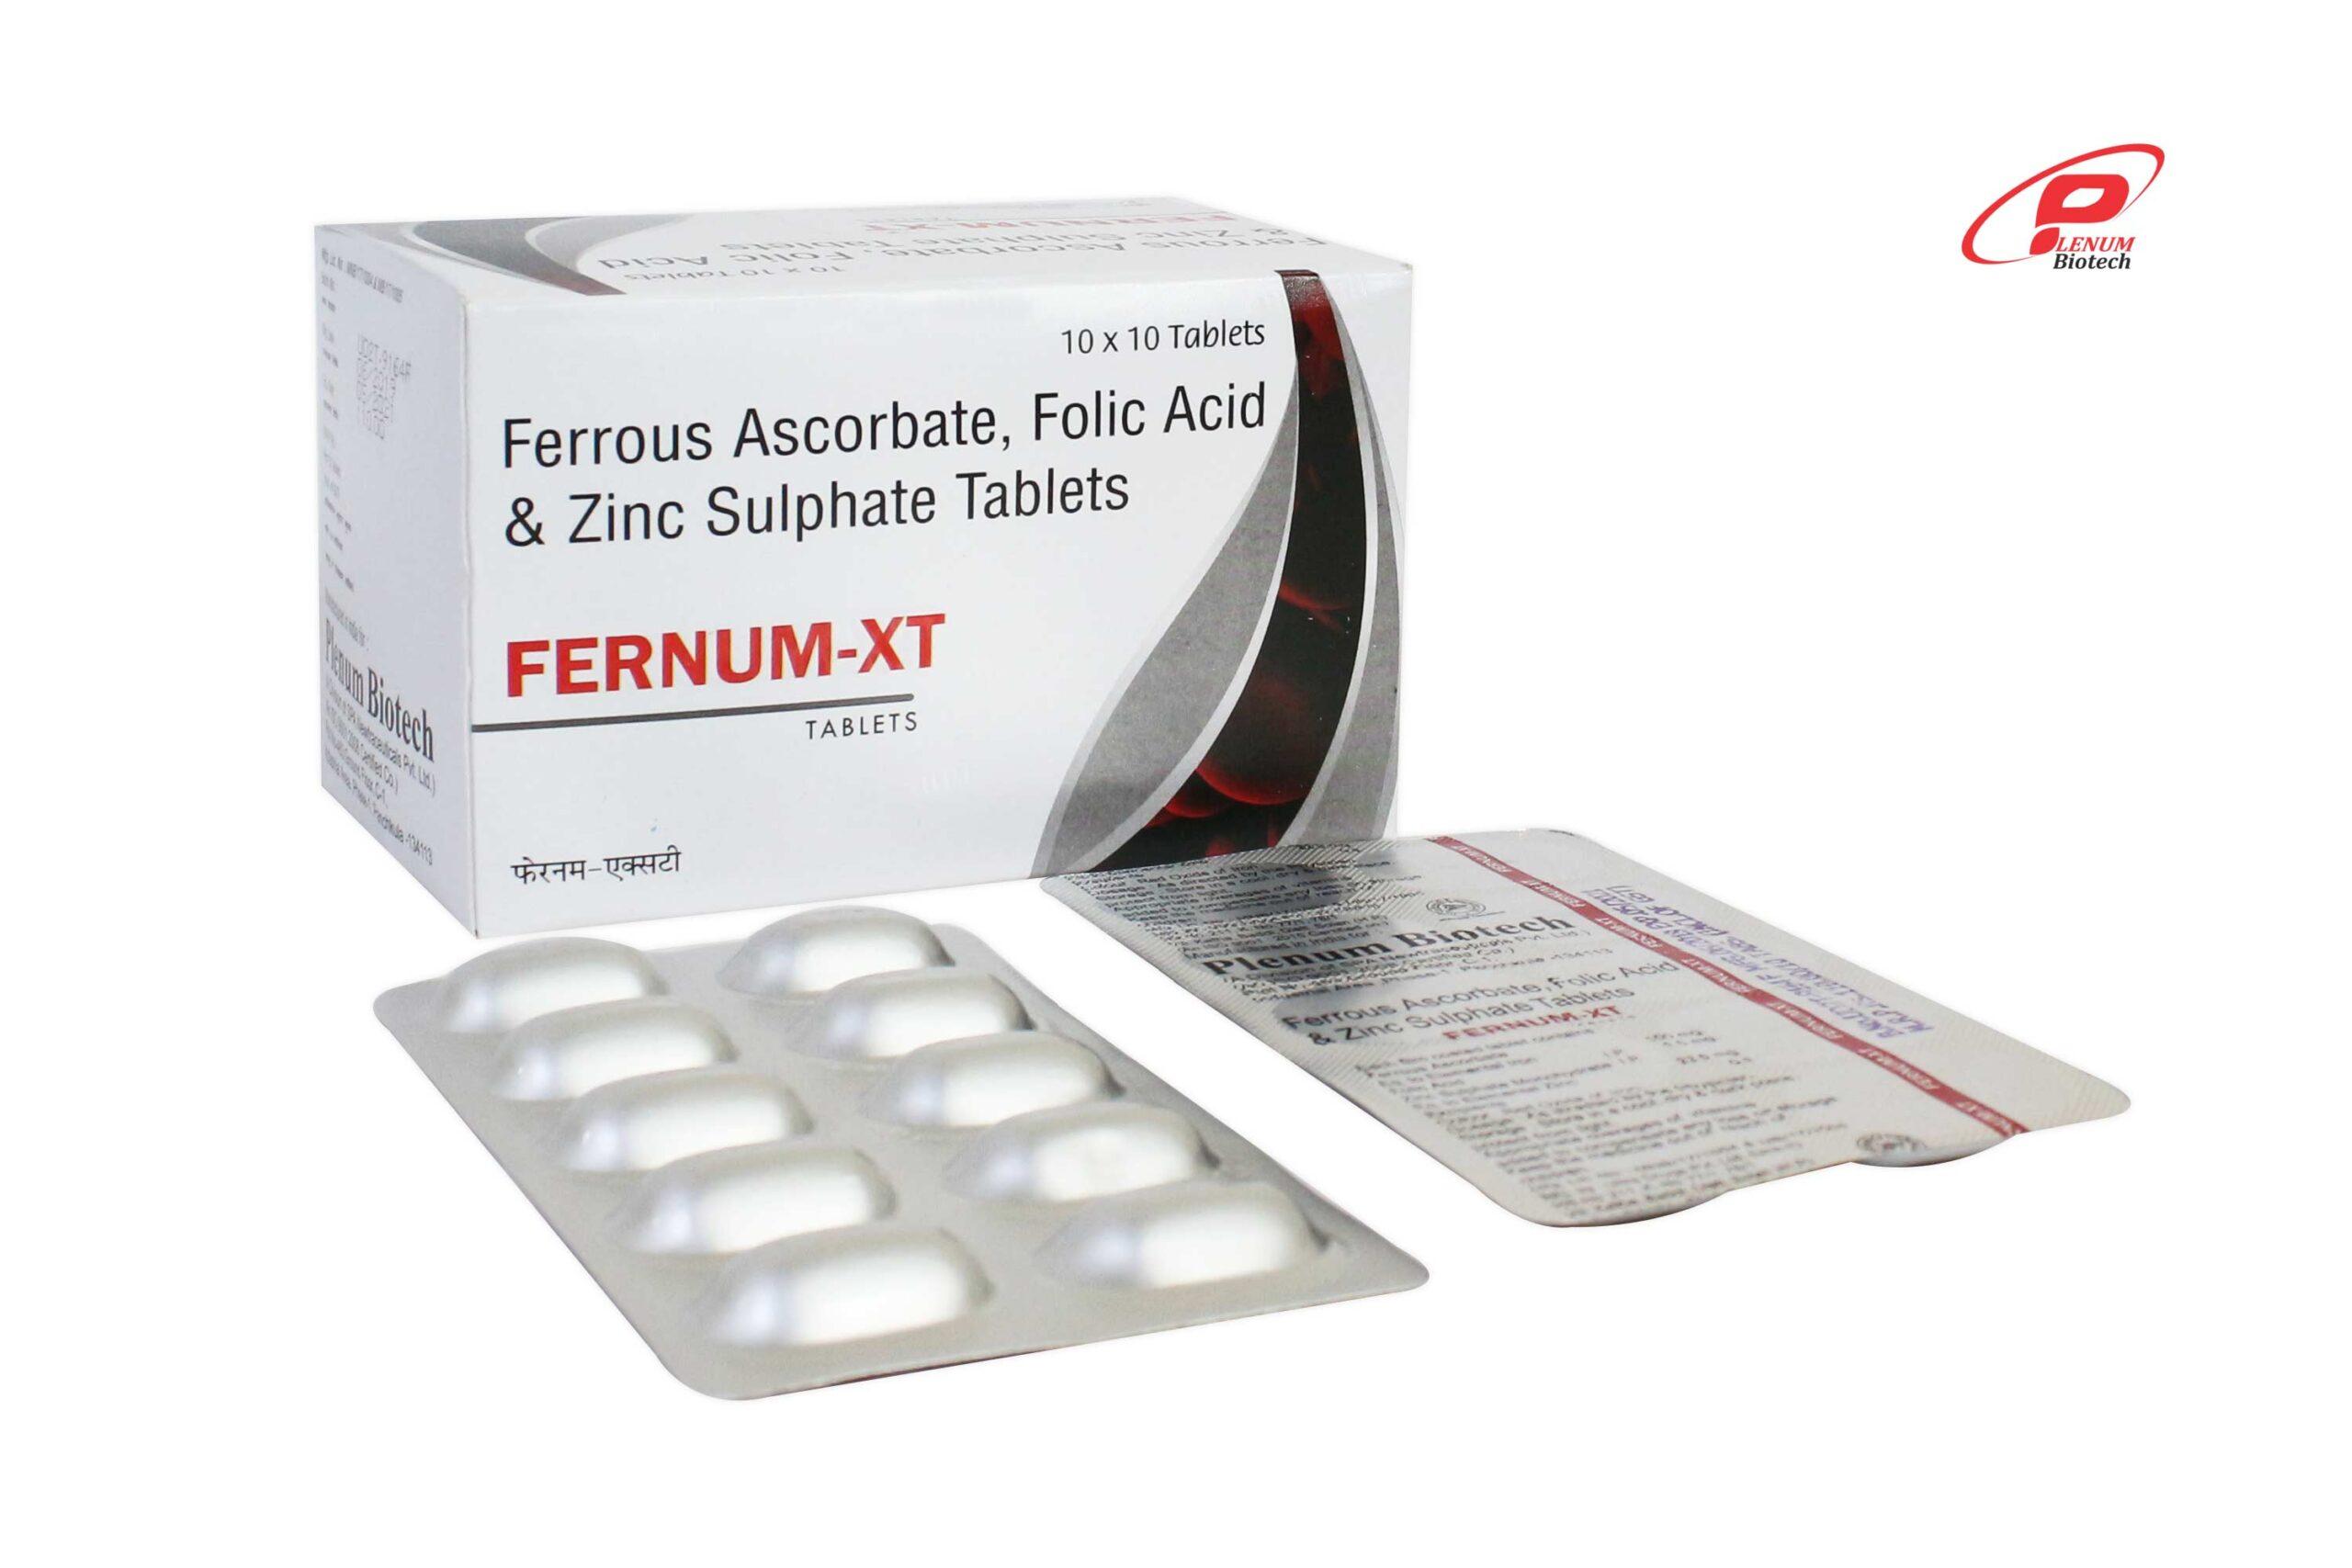 Fernum-XT tablets